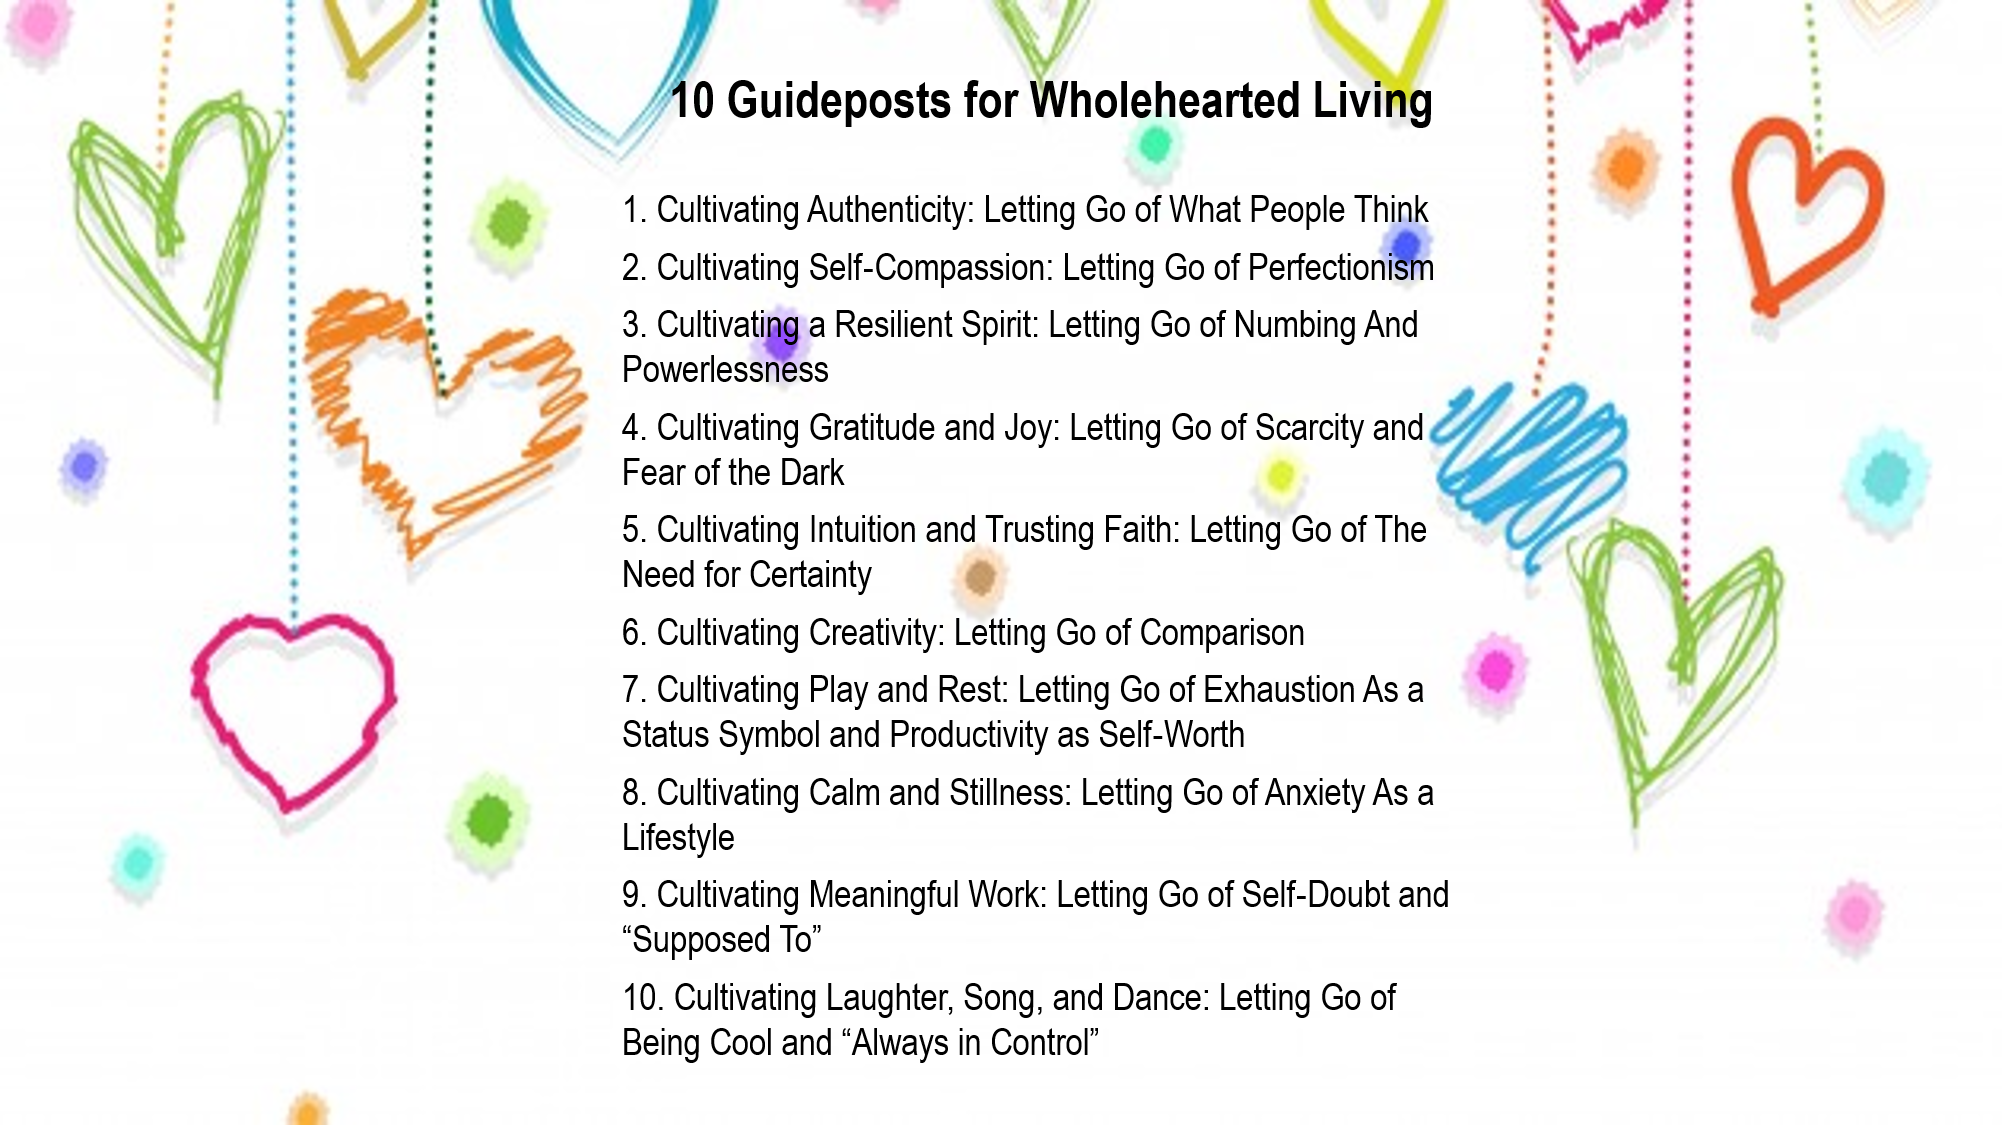 10 Guideposts